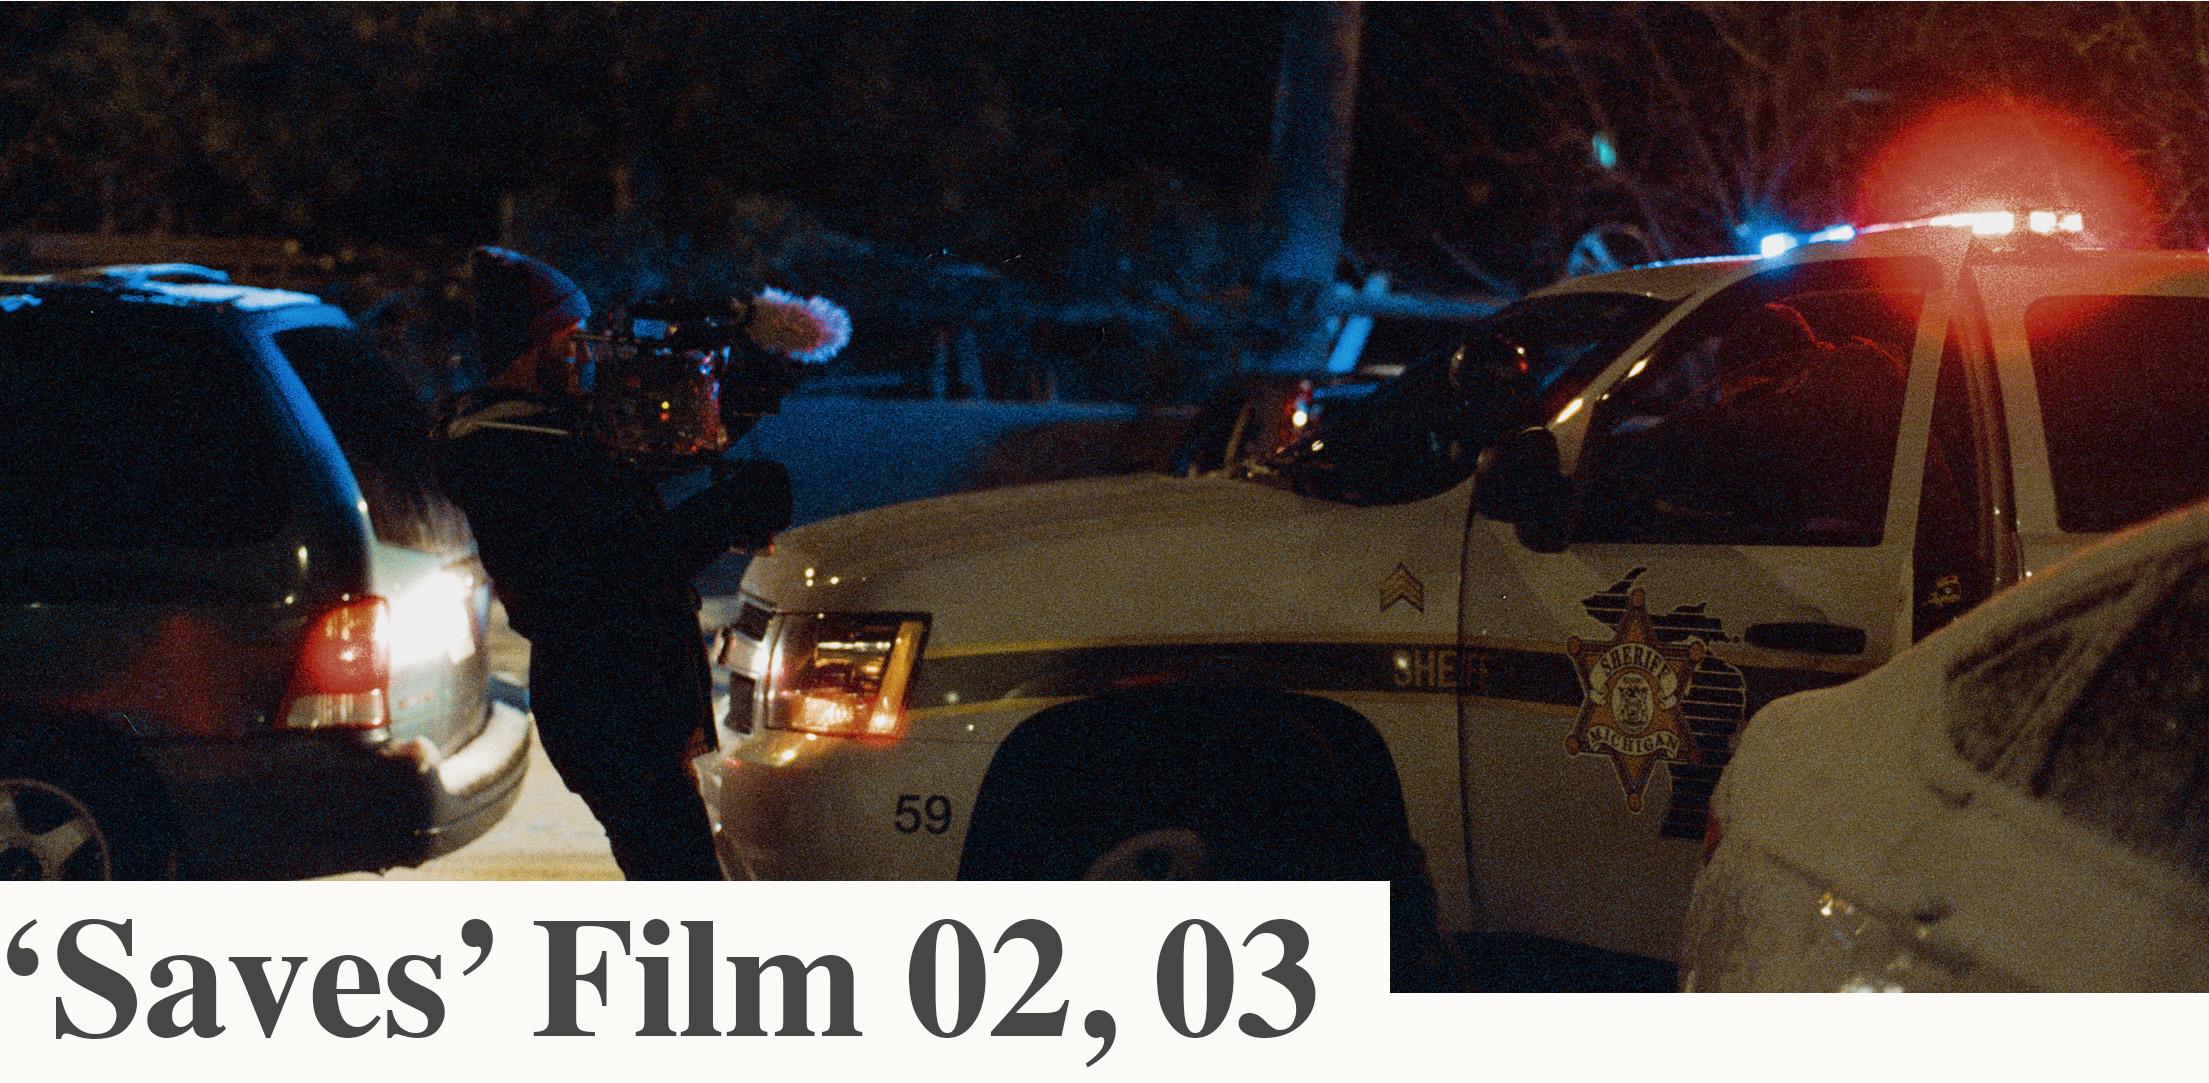 Saves Films 02 03 Title Image.jpg